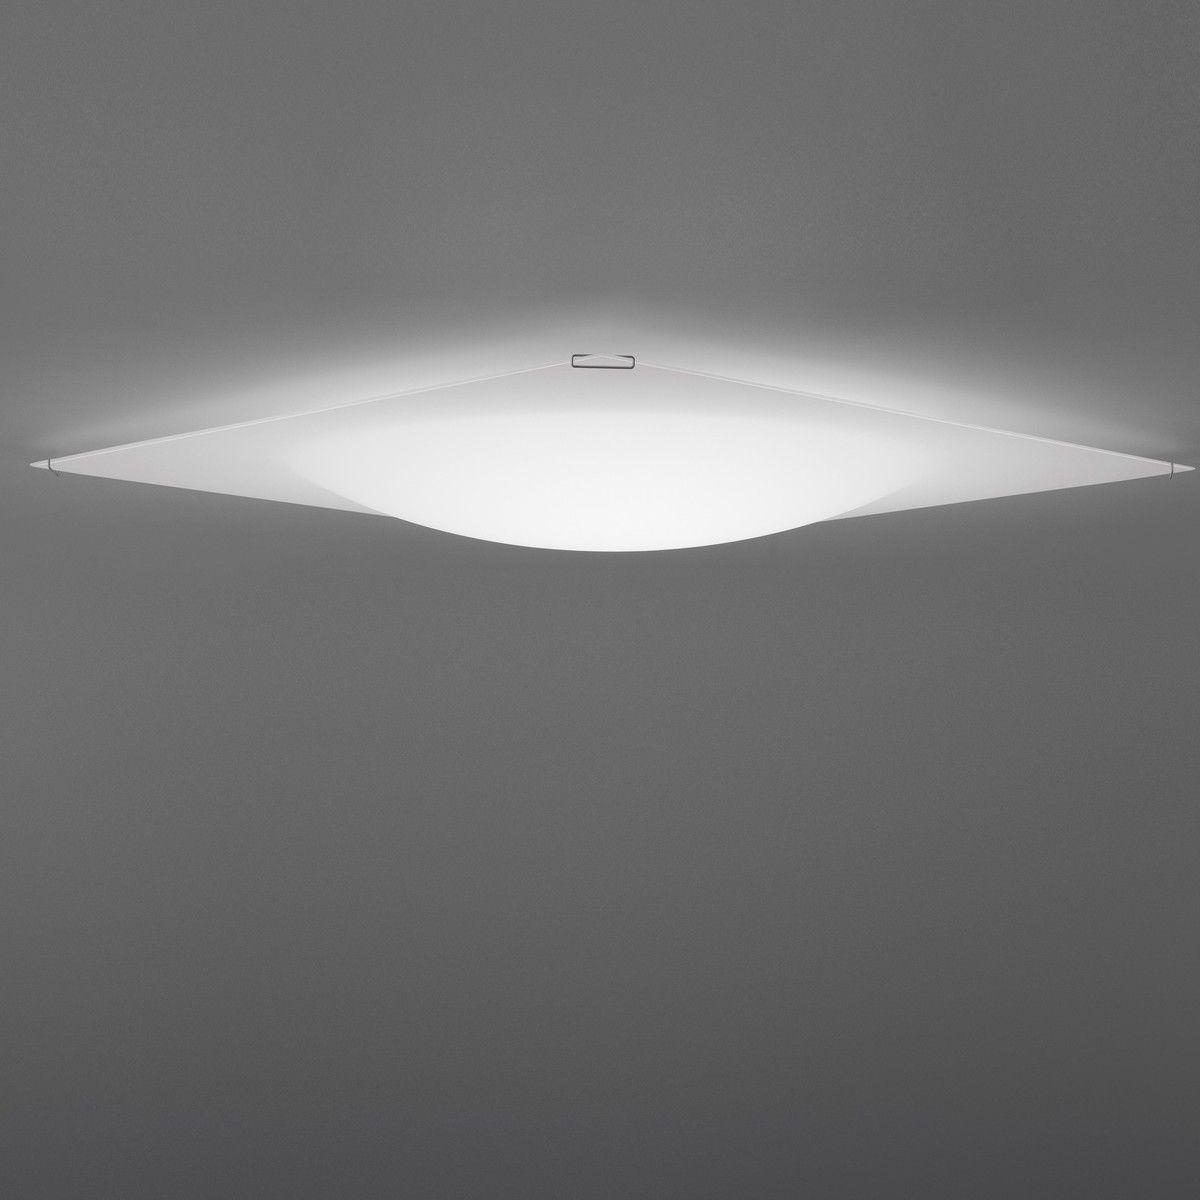 vibia quadra ice deckenleuchte tolle abbild der eafebfdeabe